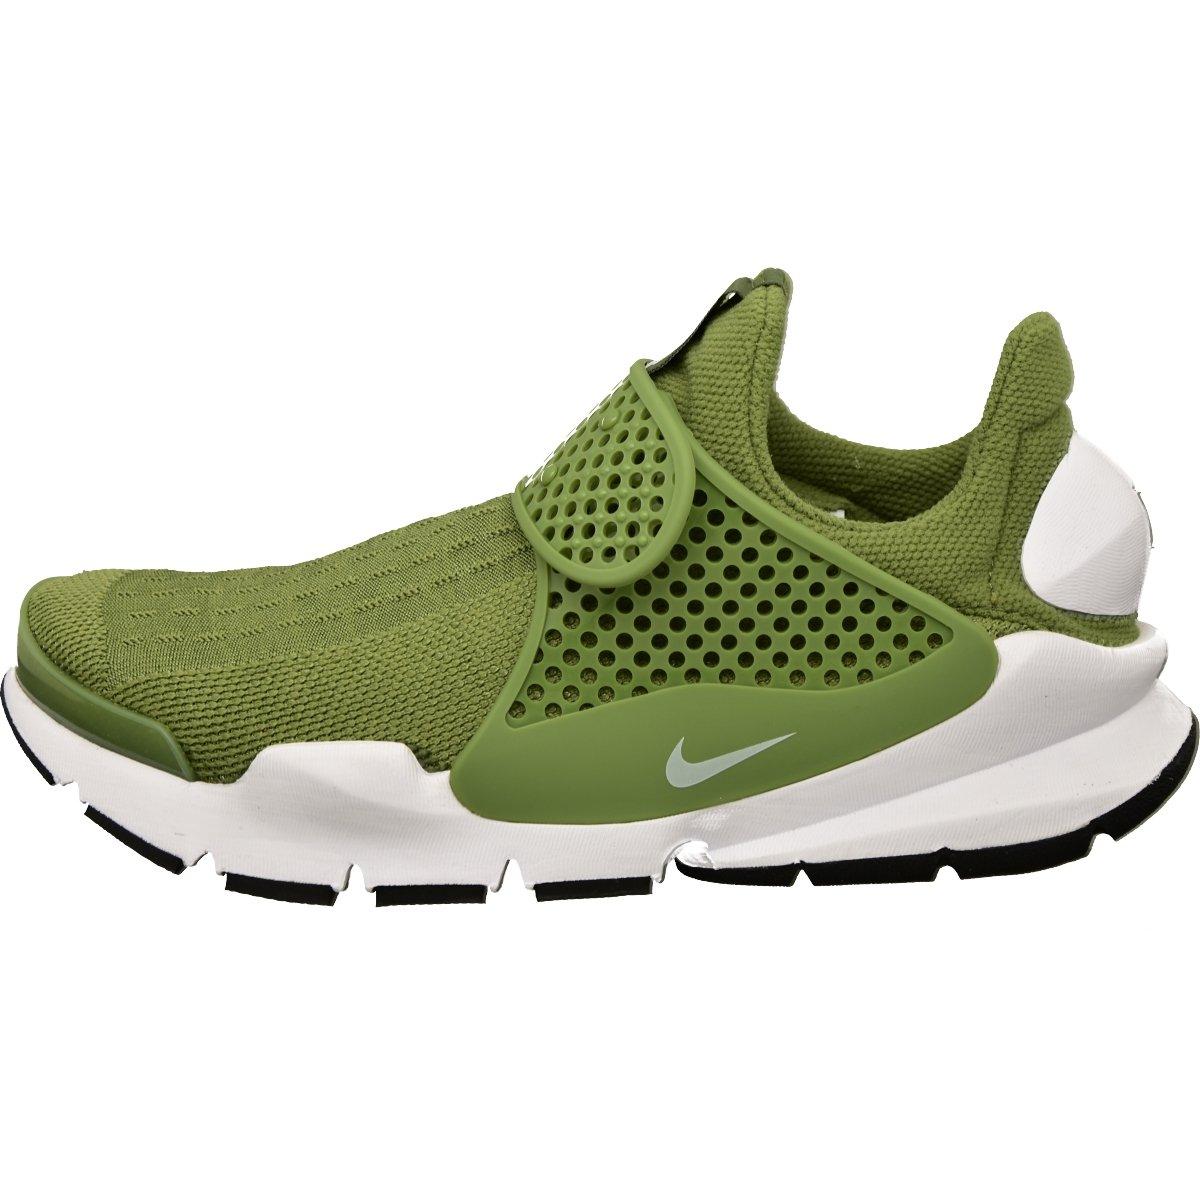 finest selection cf12b 1c093 Amazon.com | Nike Womens Sock Dart Running Trainers 848475 ...